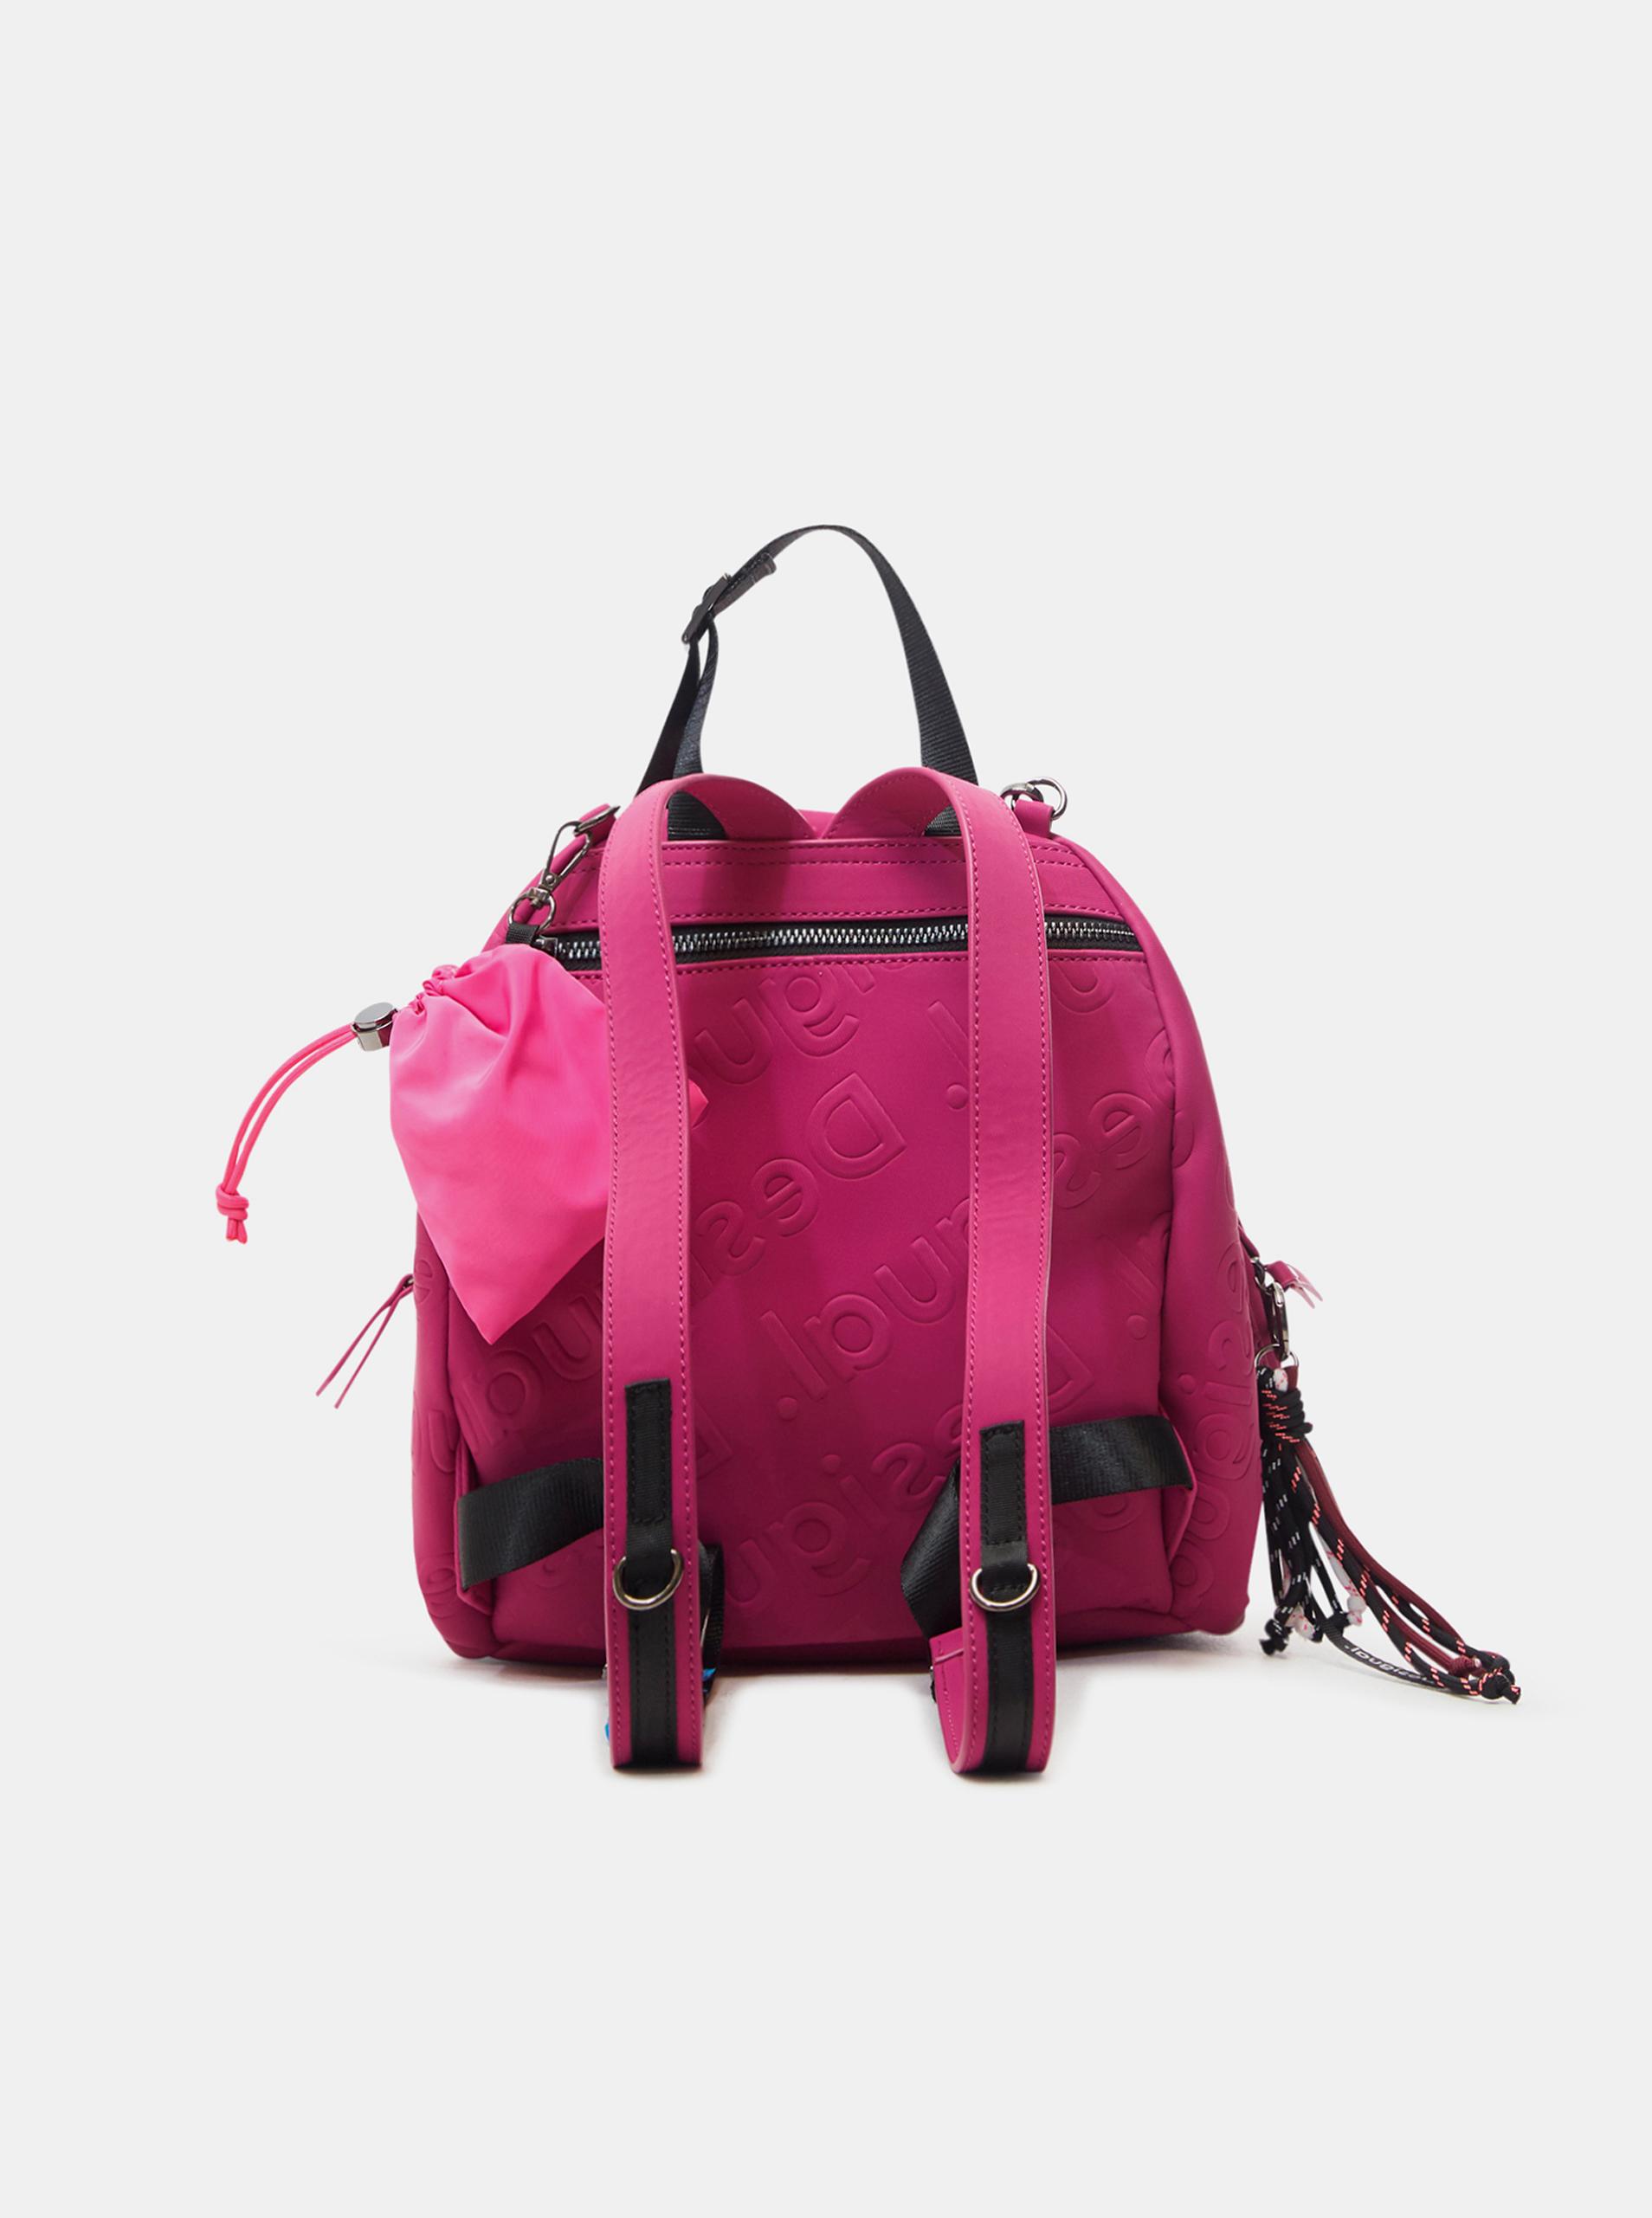 Desigual Women's backpack  Galia